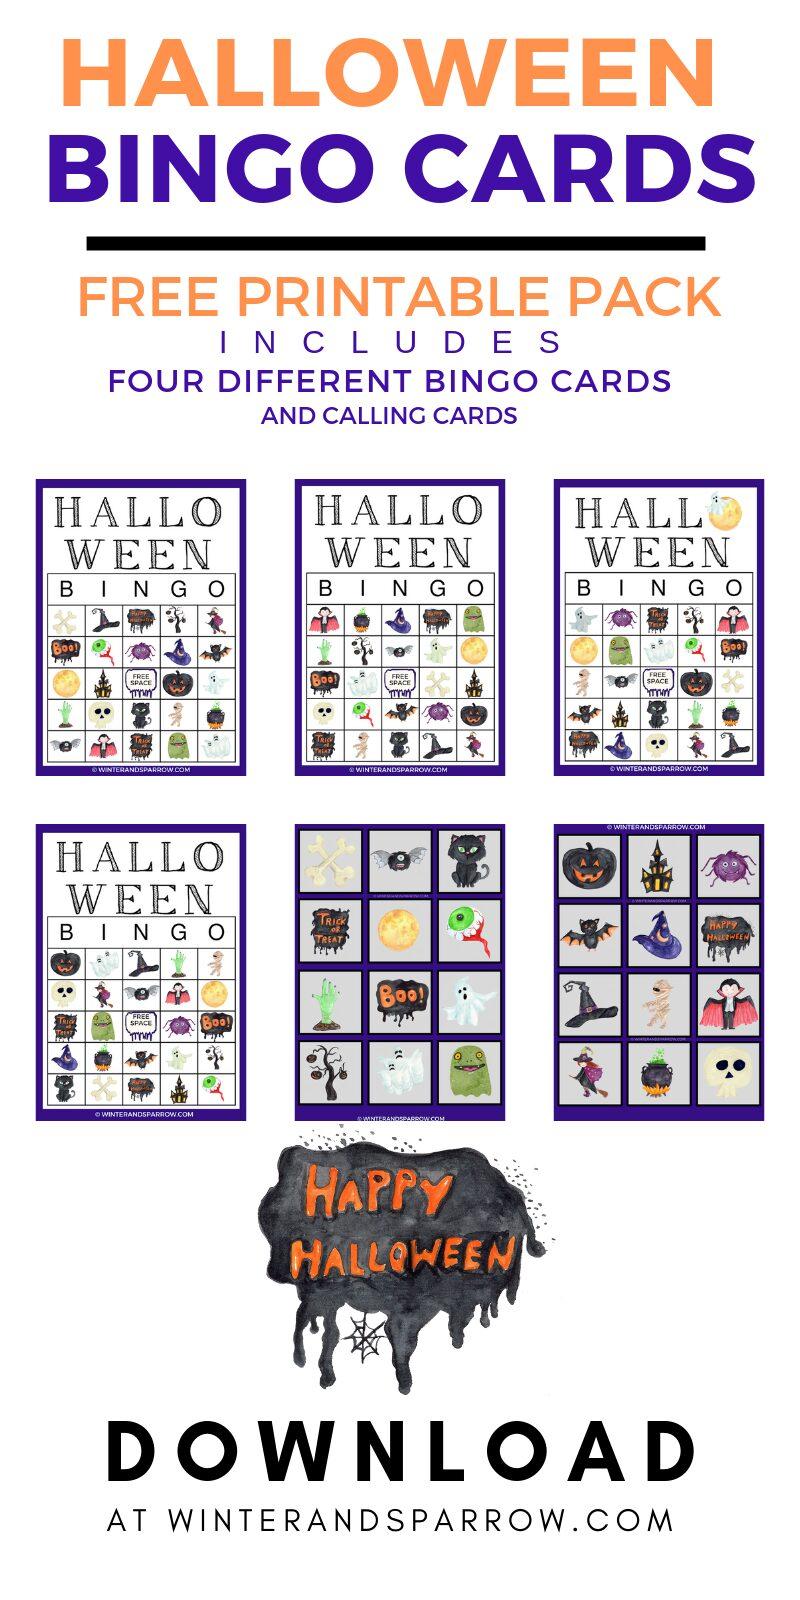 image relating to Free Printable Halloween Bingo Cards identified as Halloween Printable BINGO Playing cards: Involves 4 Alternative